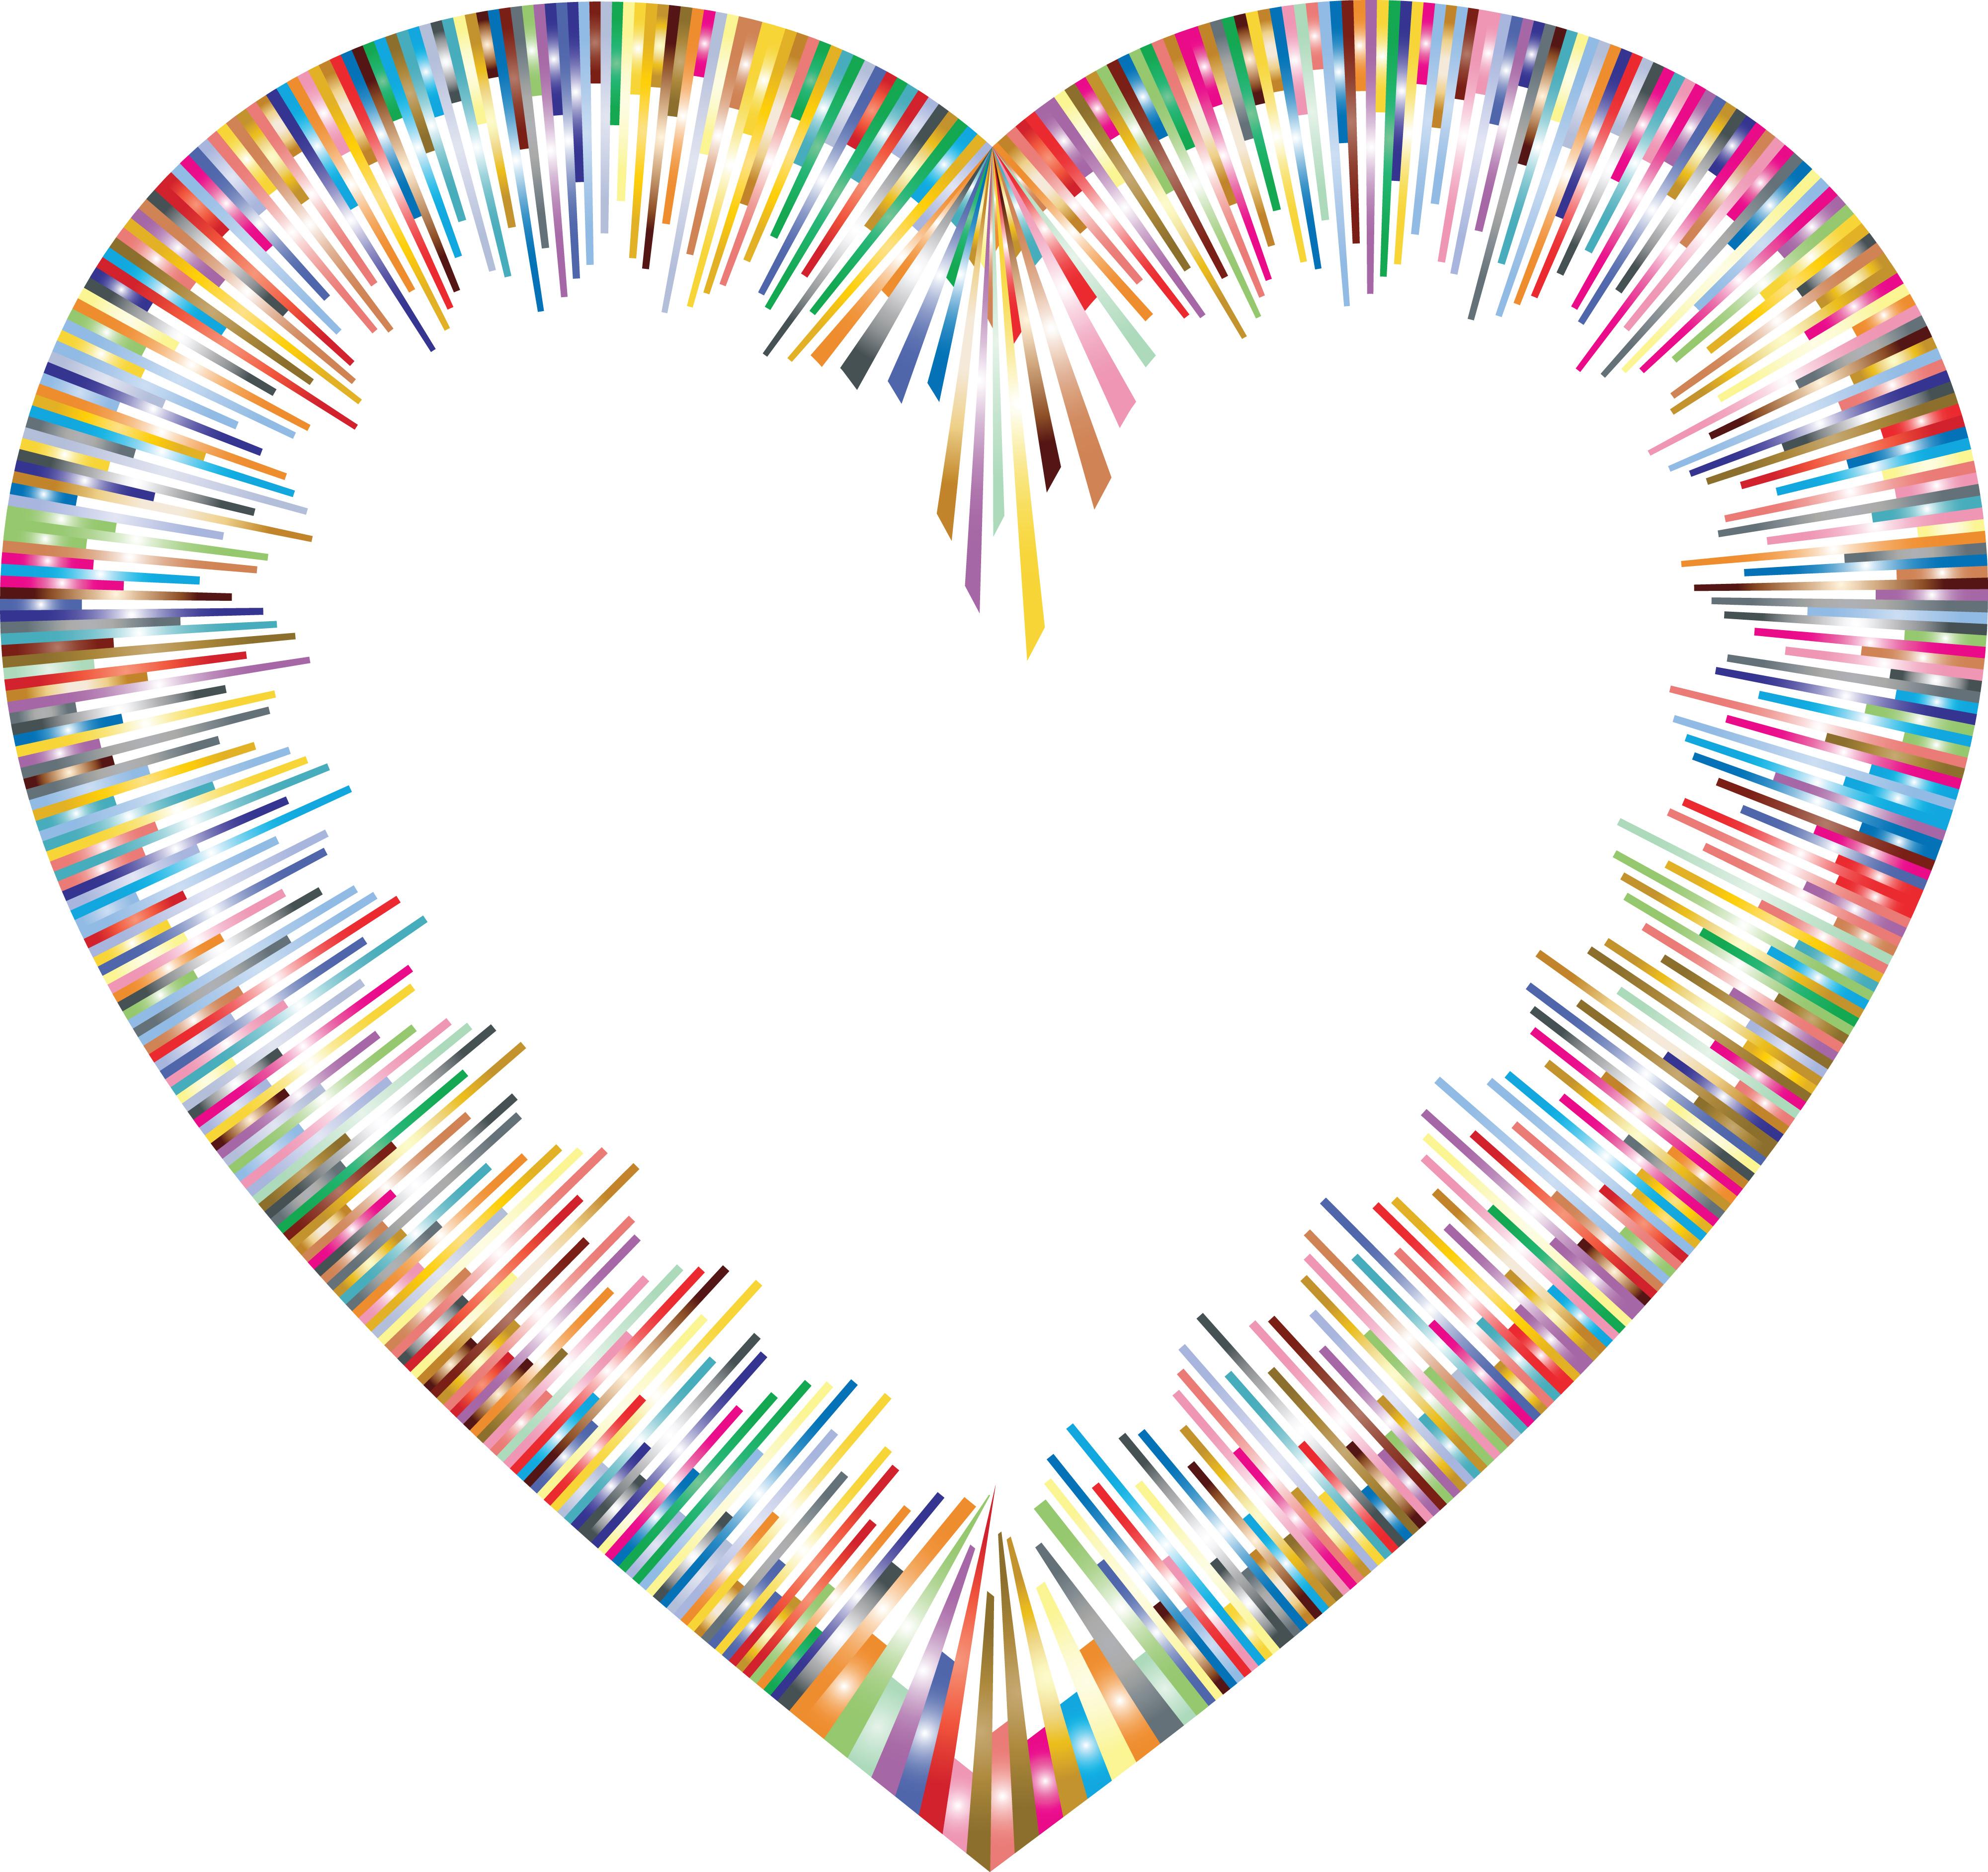 565 Heart Border free clipart.